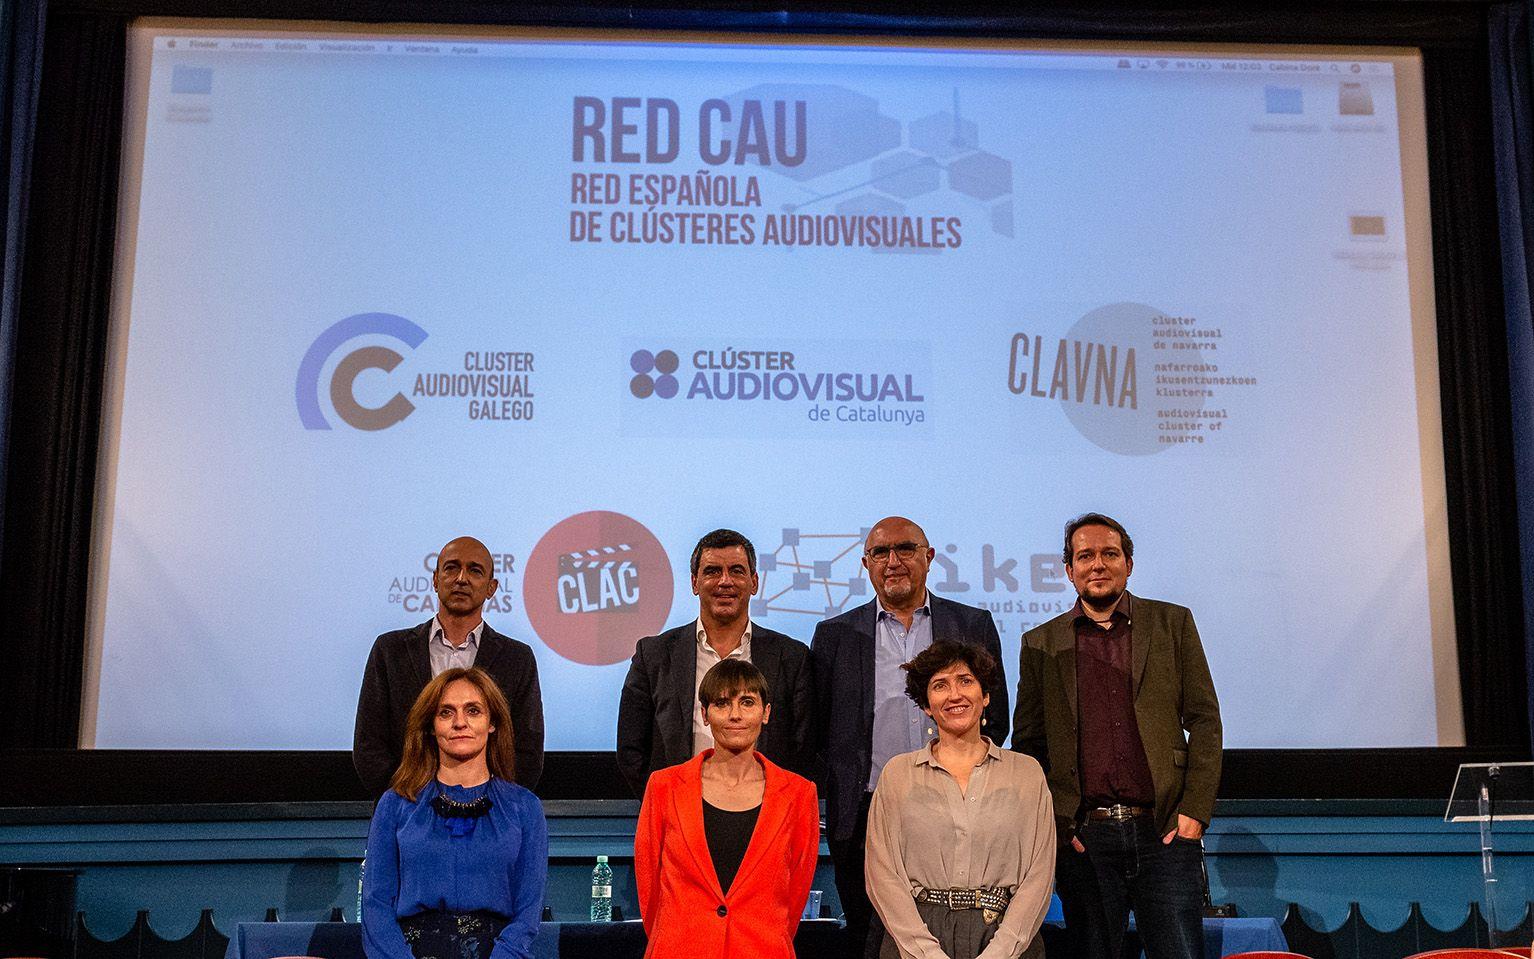 EIKEN impulsa junto a cuatro clústeres REDCAU: Red Española de Clústeres Audiovisuales